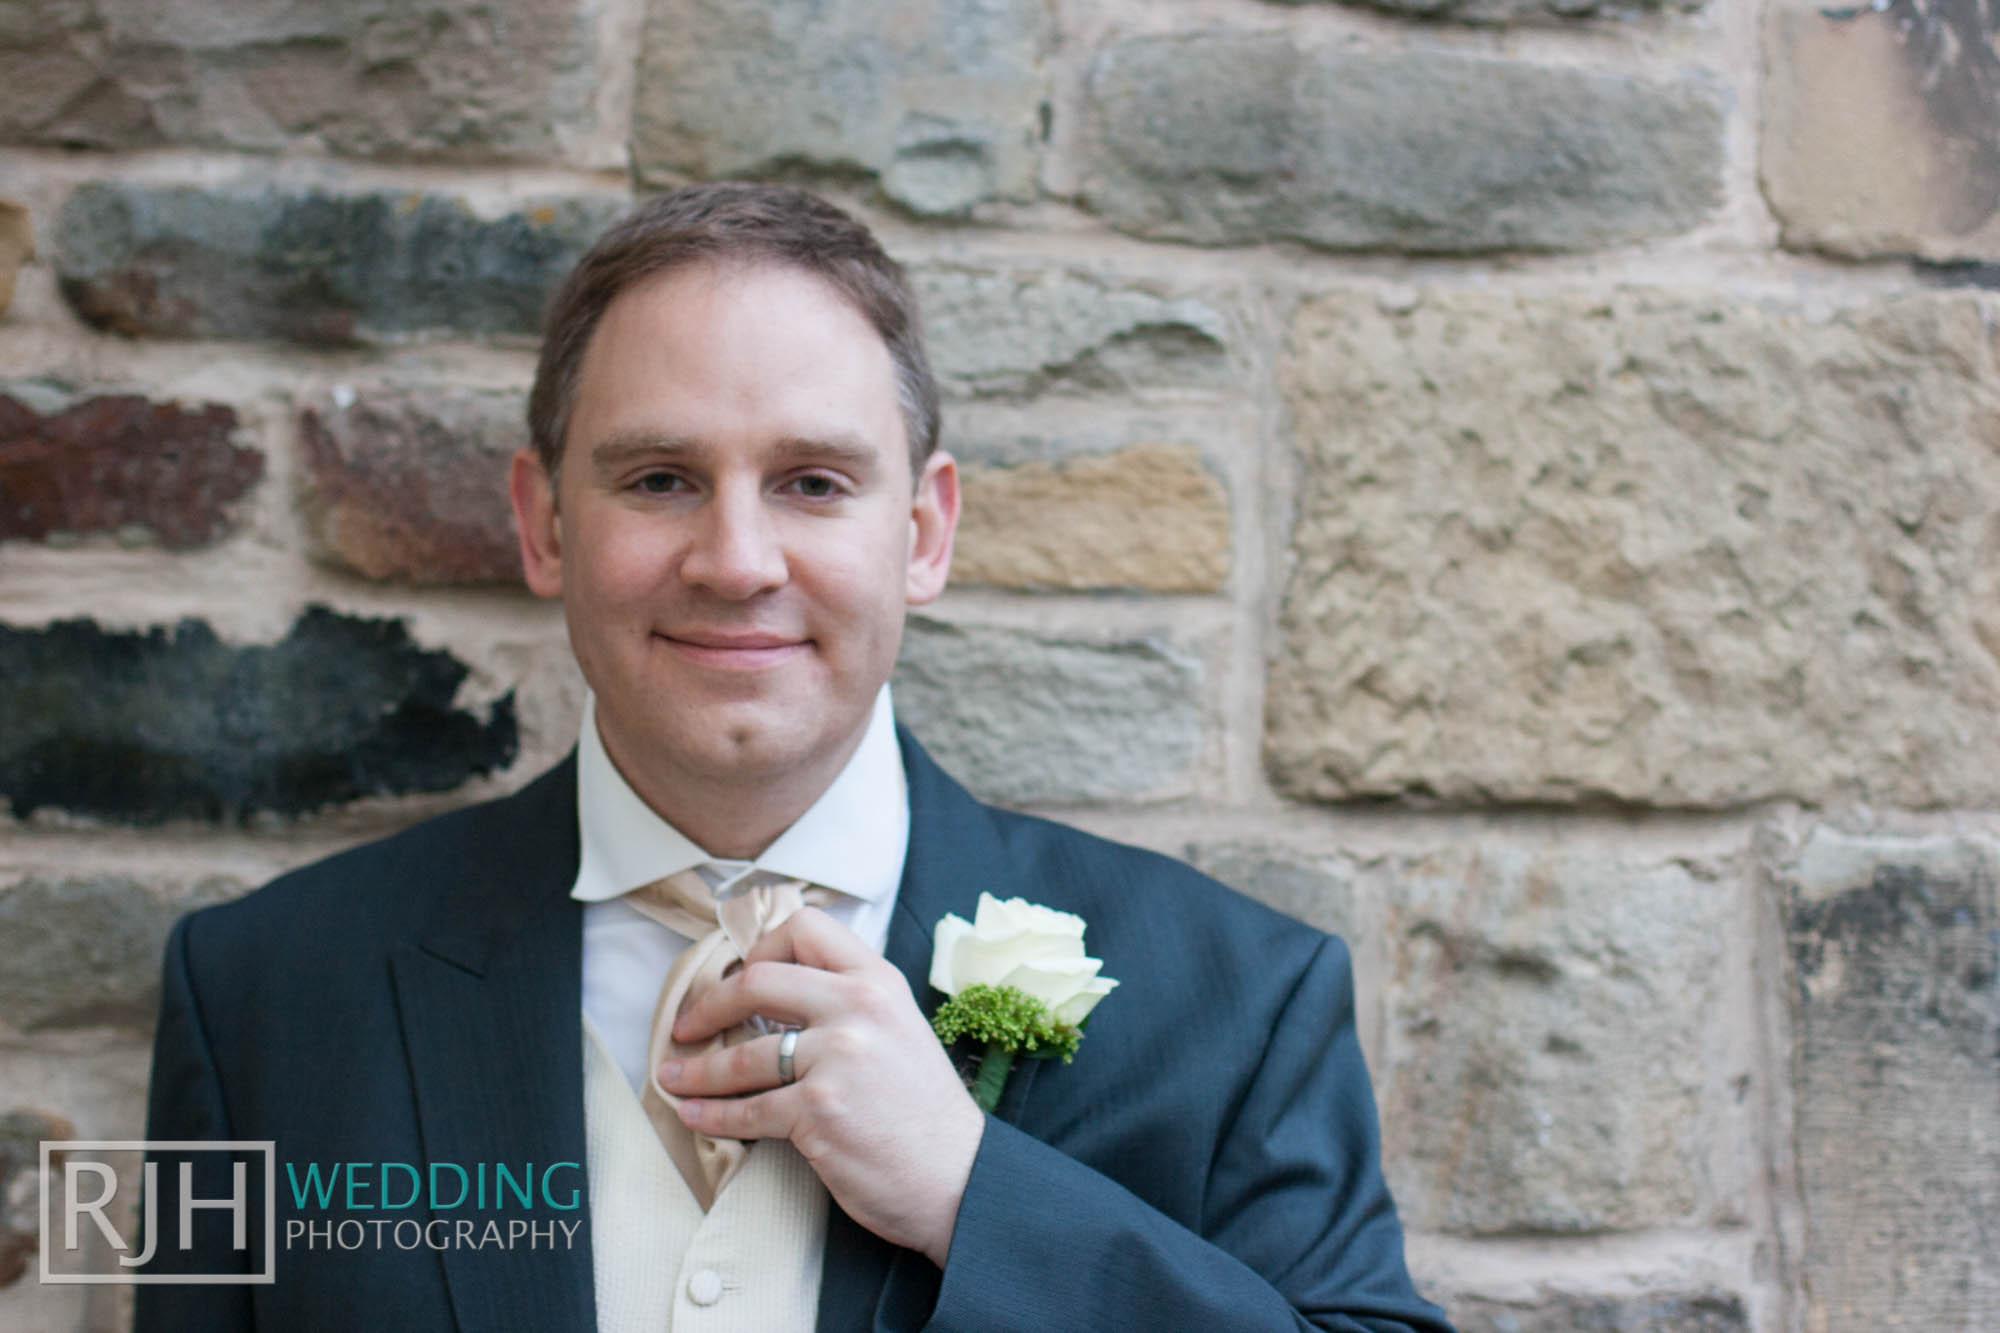 RJH Wedding Photography_2014 highlights_08.jpg